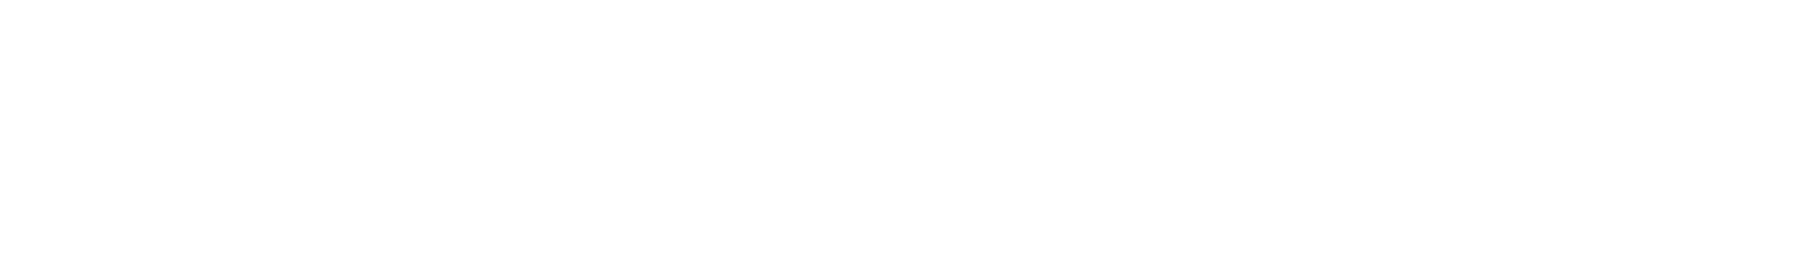 guitarblues28 130